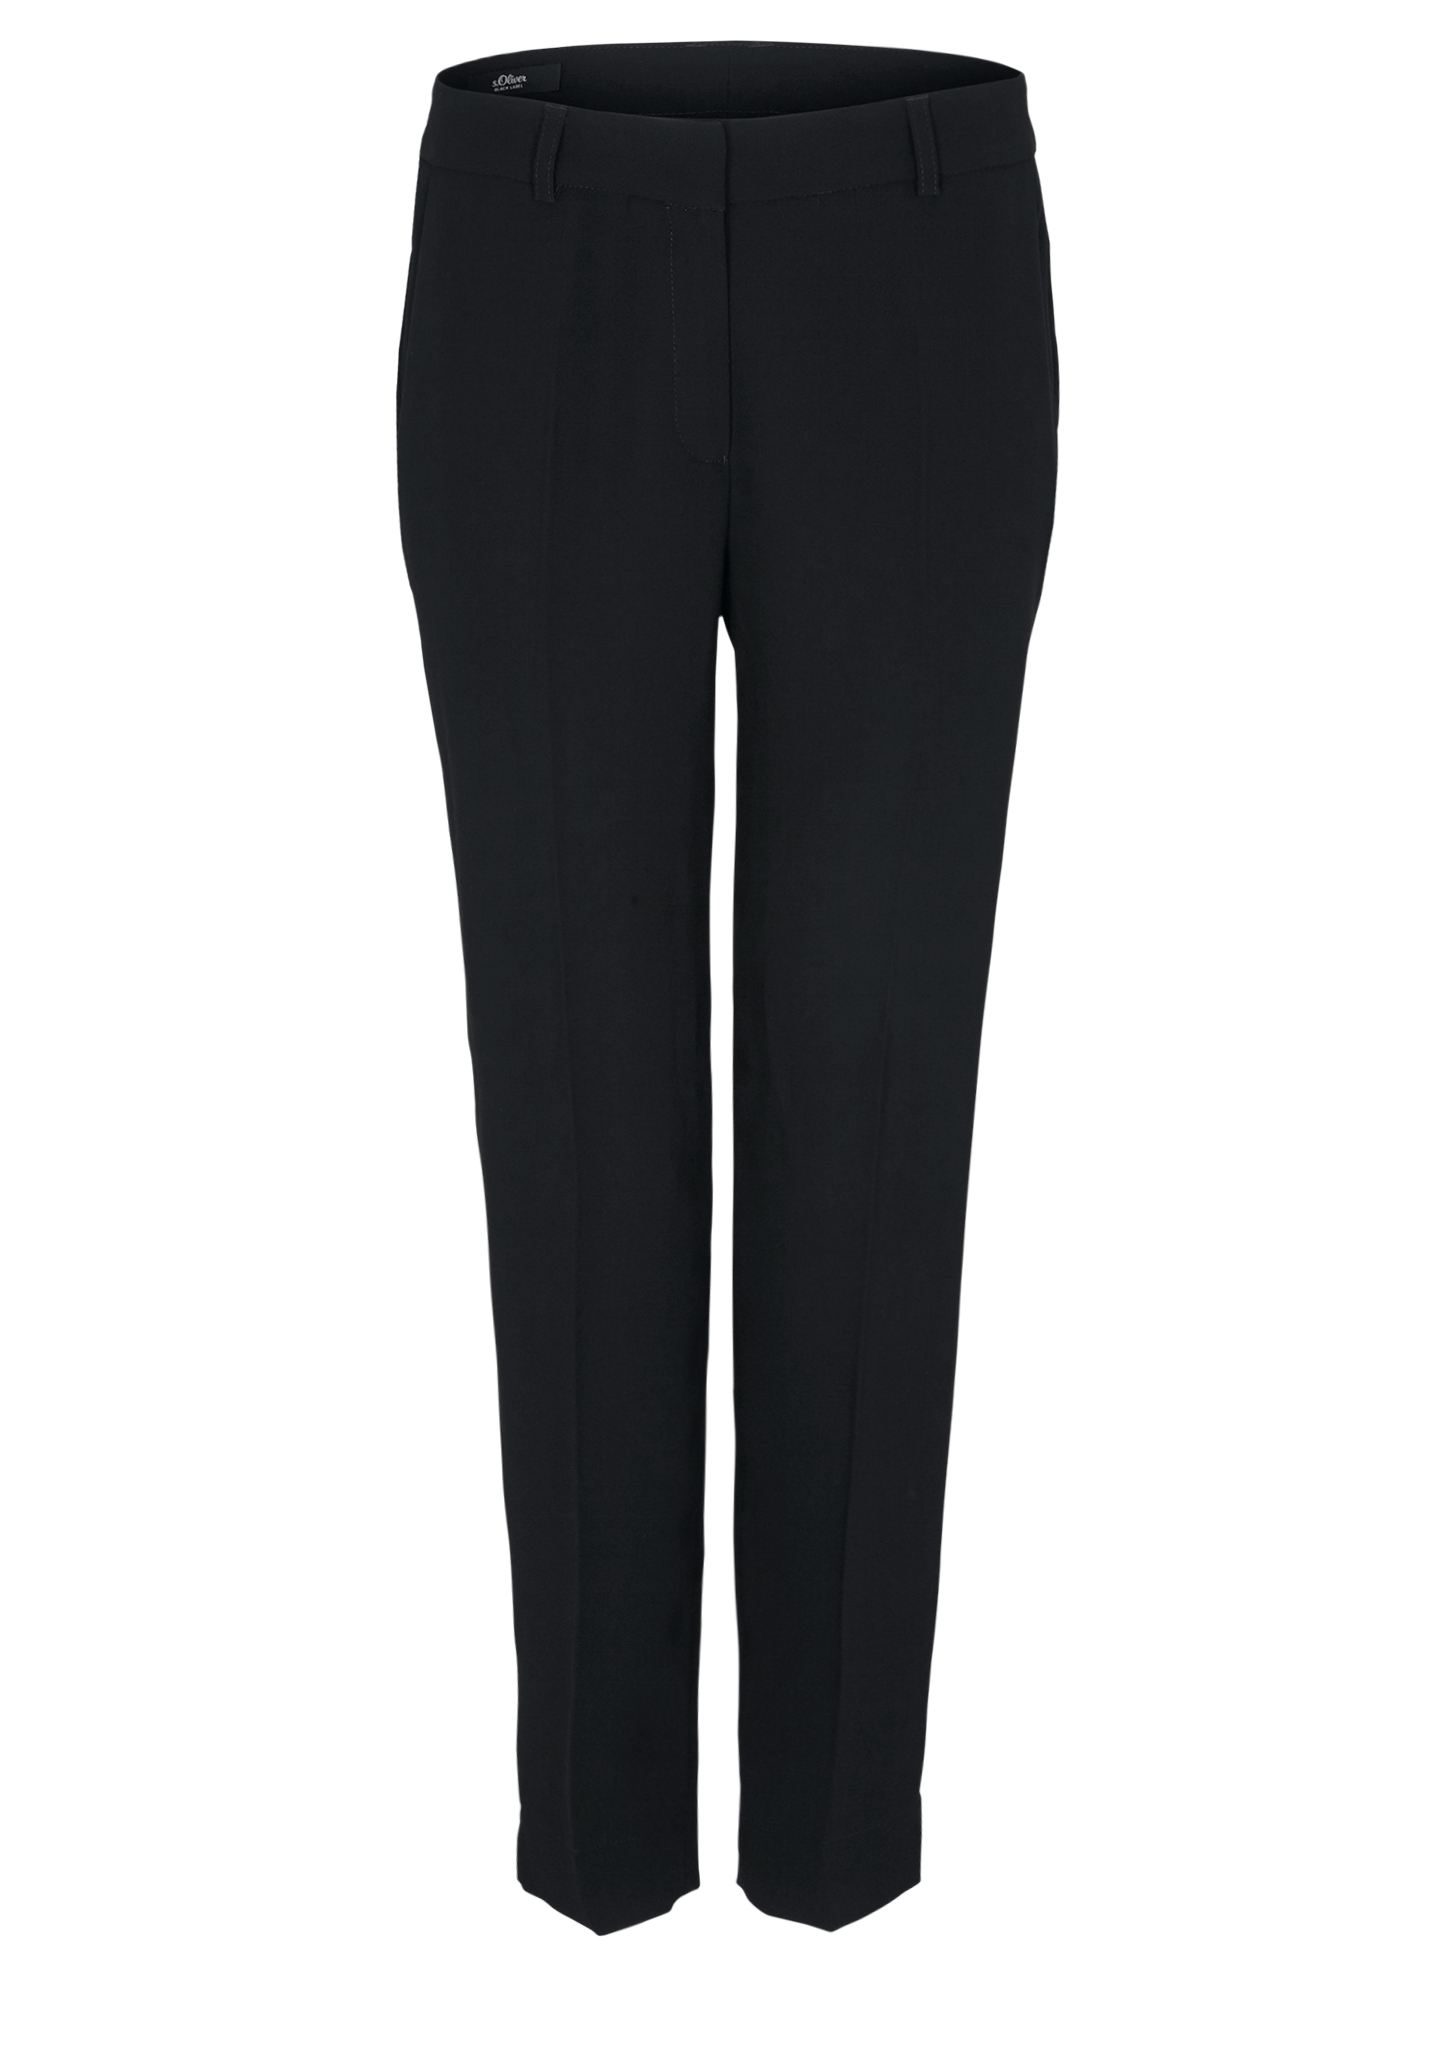 Bügelfaltenhose | Bekleidung > Hosen > Bügelfaltenhosen | s.Oliver BLACK LABEL